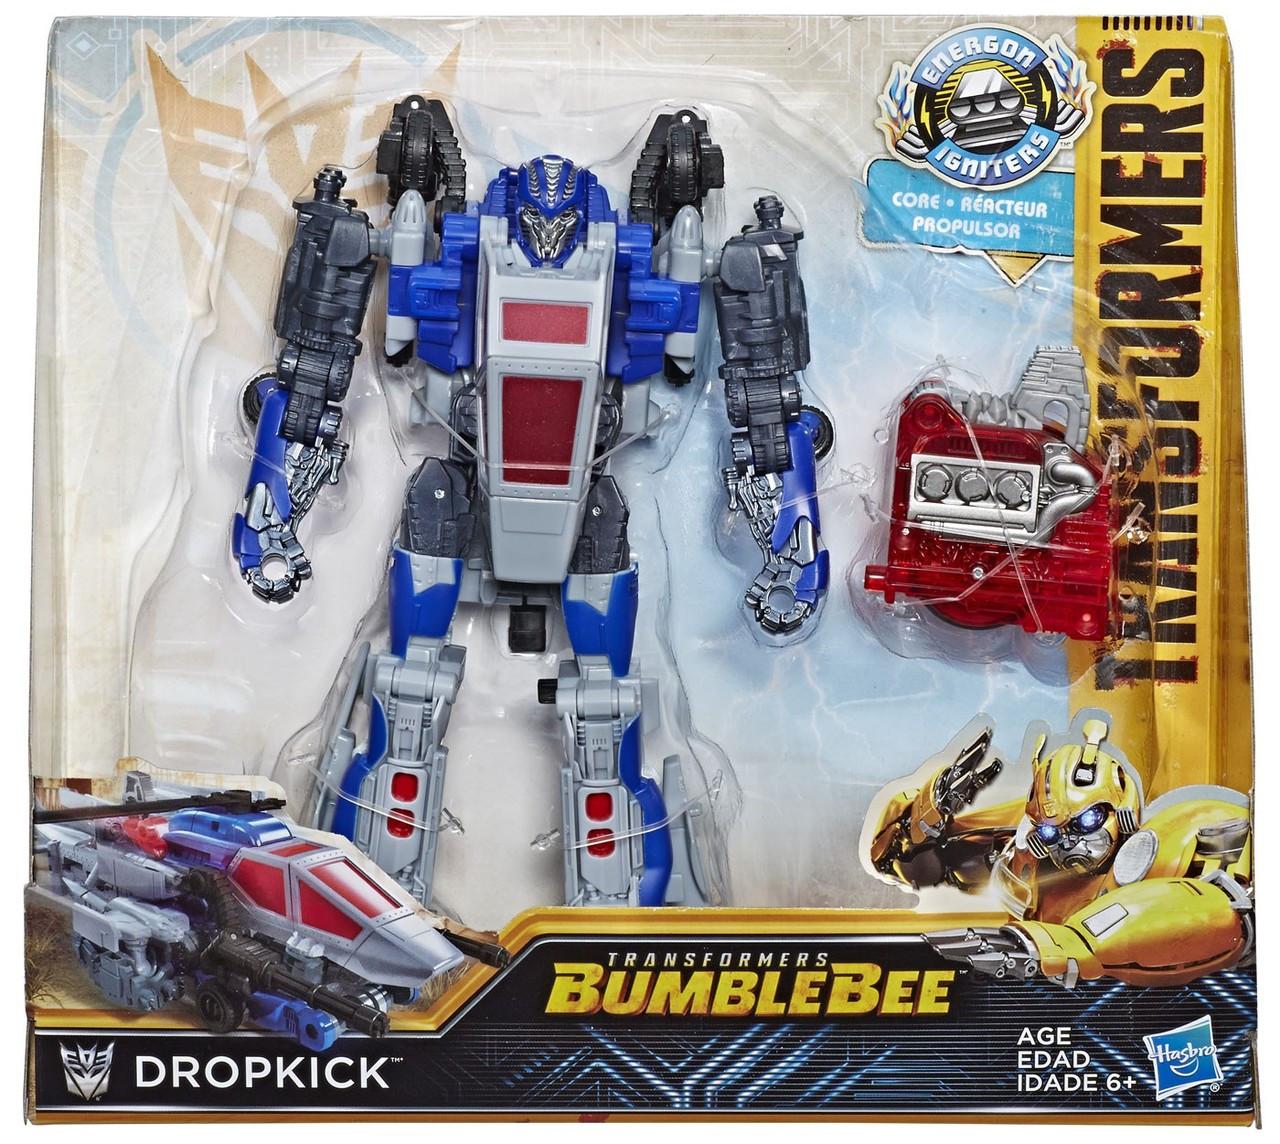 New Hasbro Transformers Energon Igniters Bumblebee Movie Action Figure